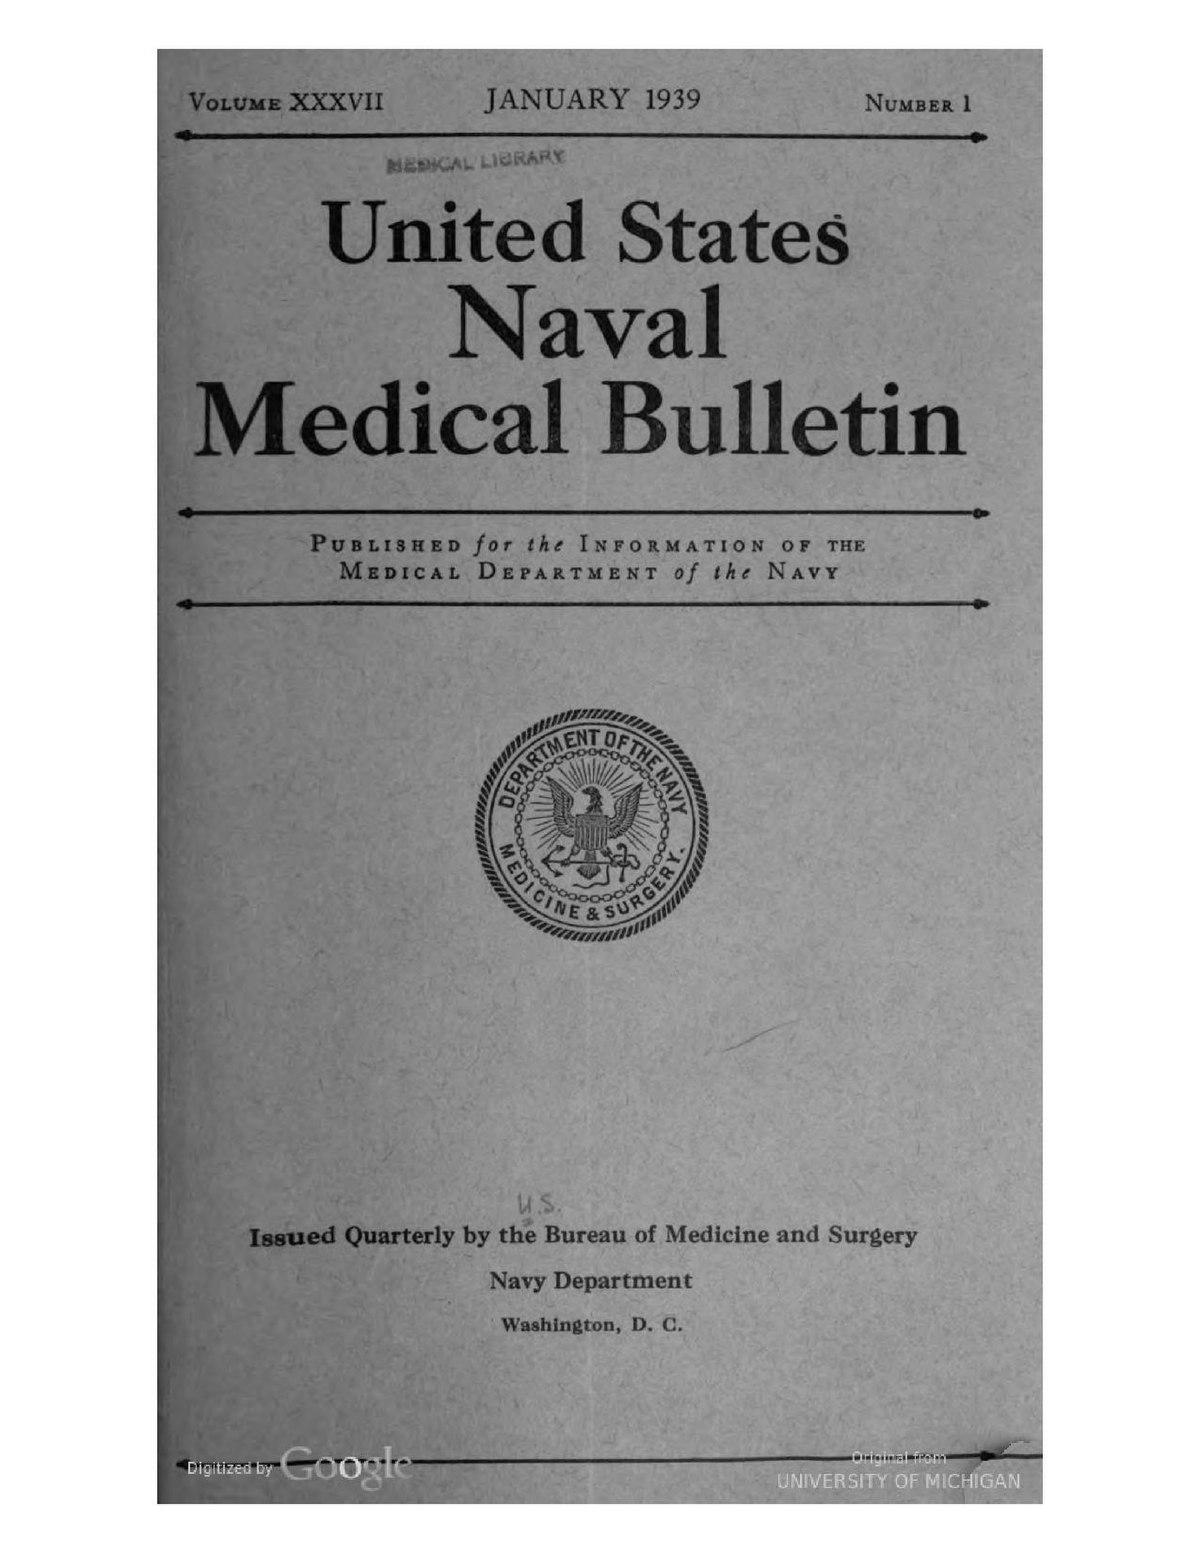 File:United States Naval Medical Bulletin Vol. 37, Nos. 1-4, 1939 ...